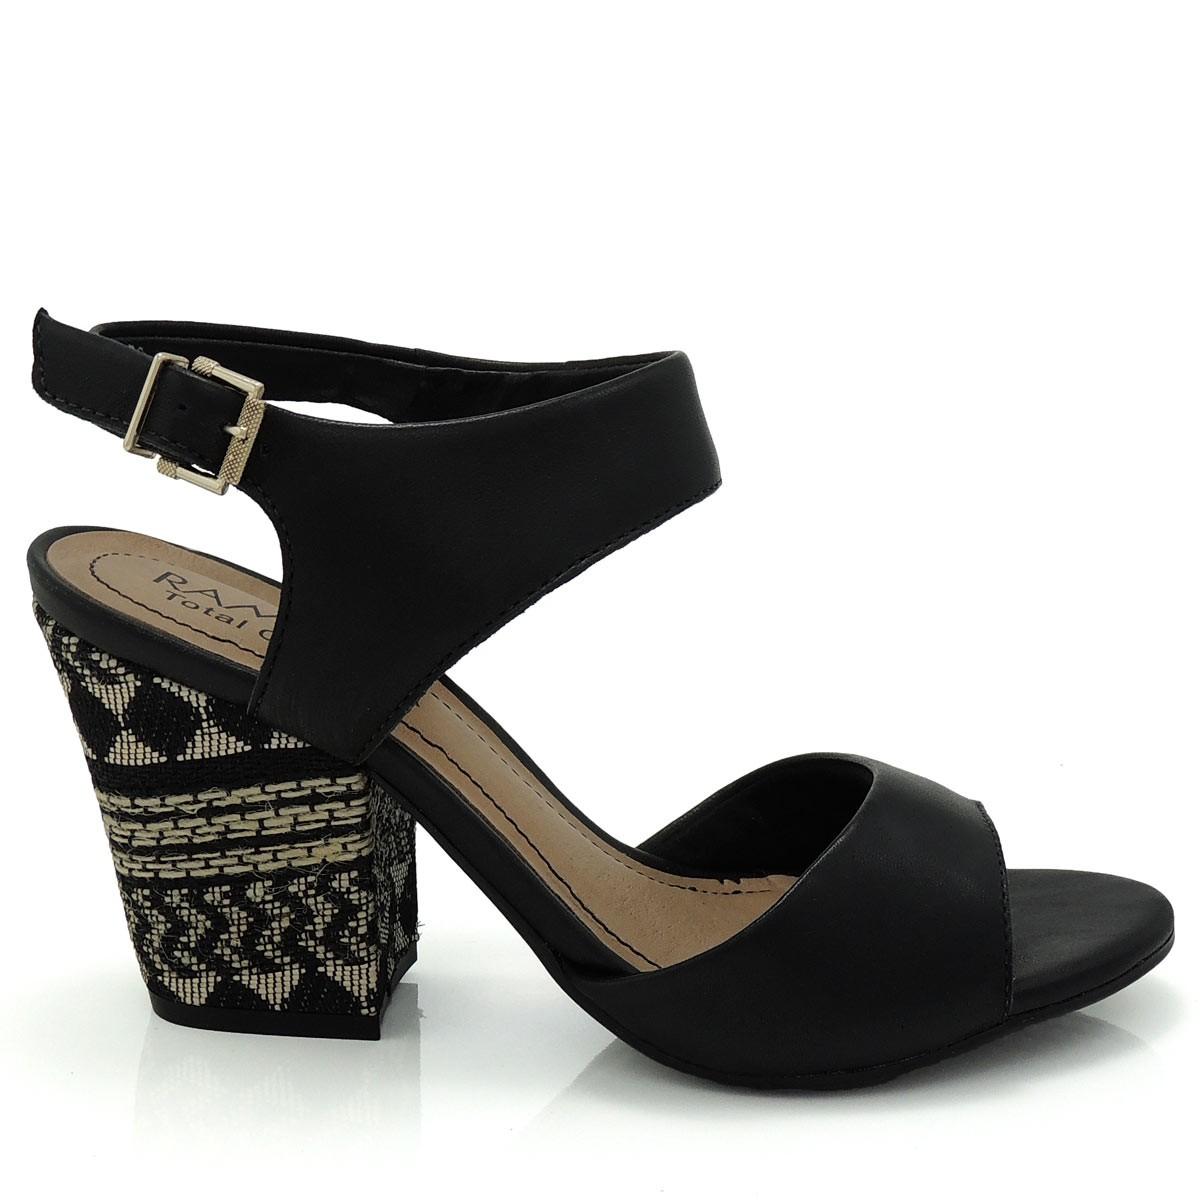 63da90be1 sandalia-feminina-ramarim-total-comfort-1541202-salto-grosso-couro -685827112538d79ee5fc9de06b8c1e7d.jpg